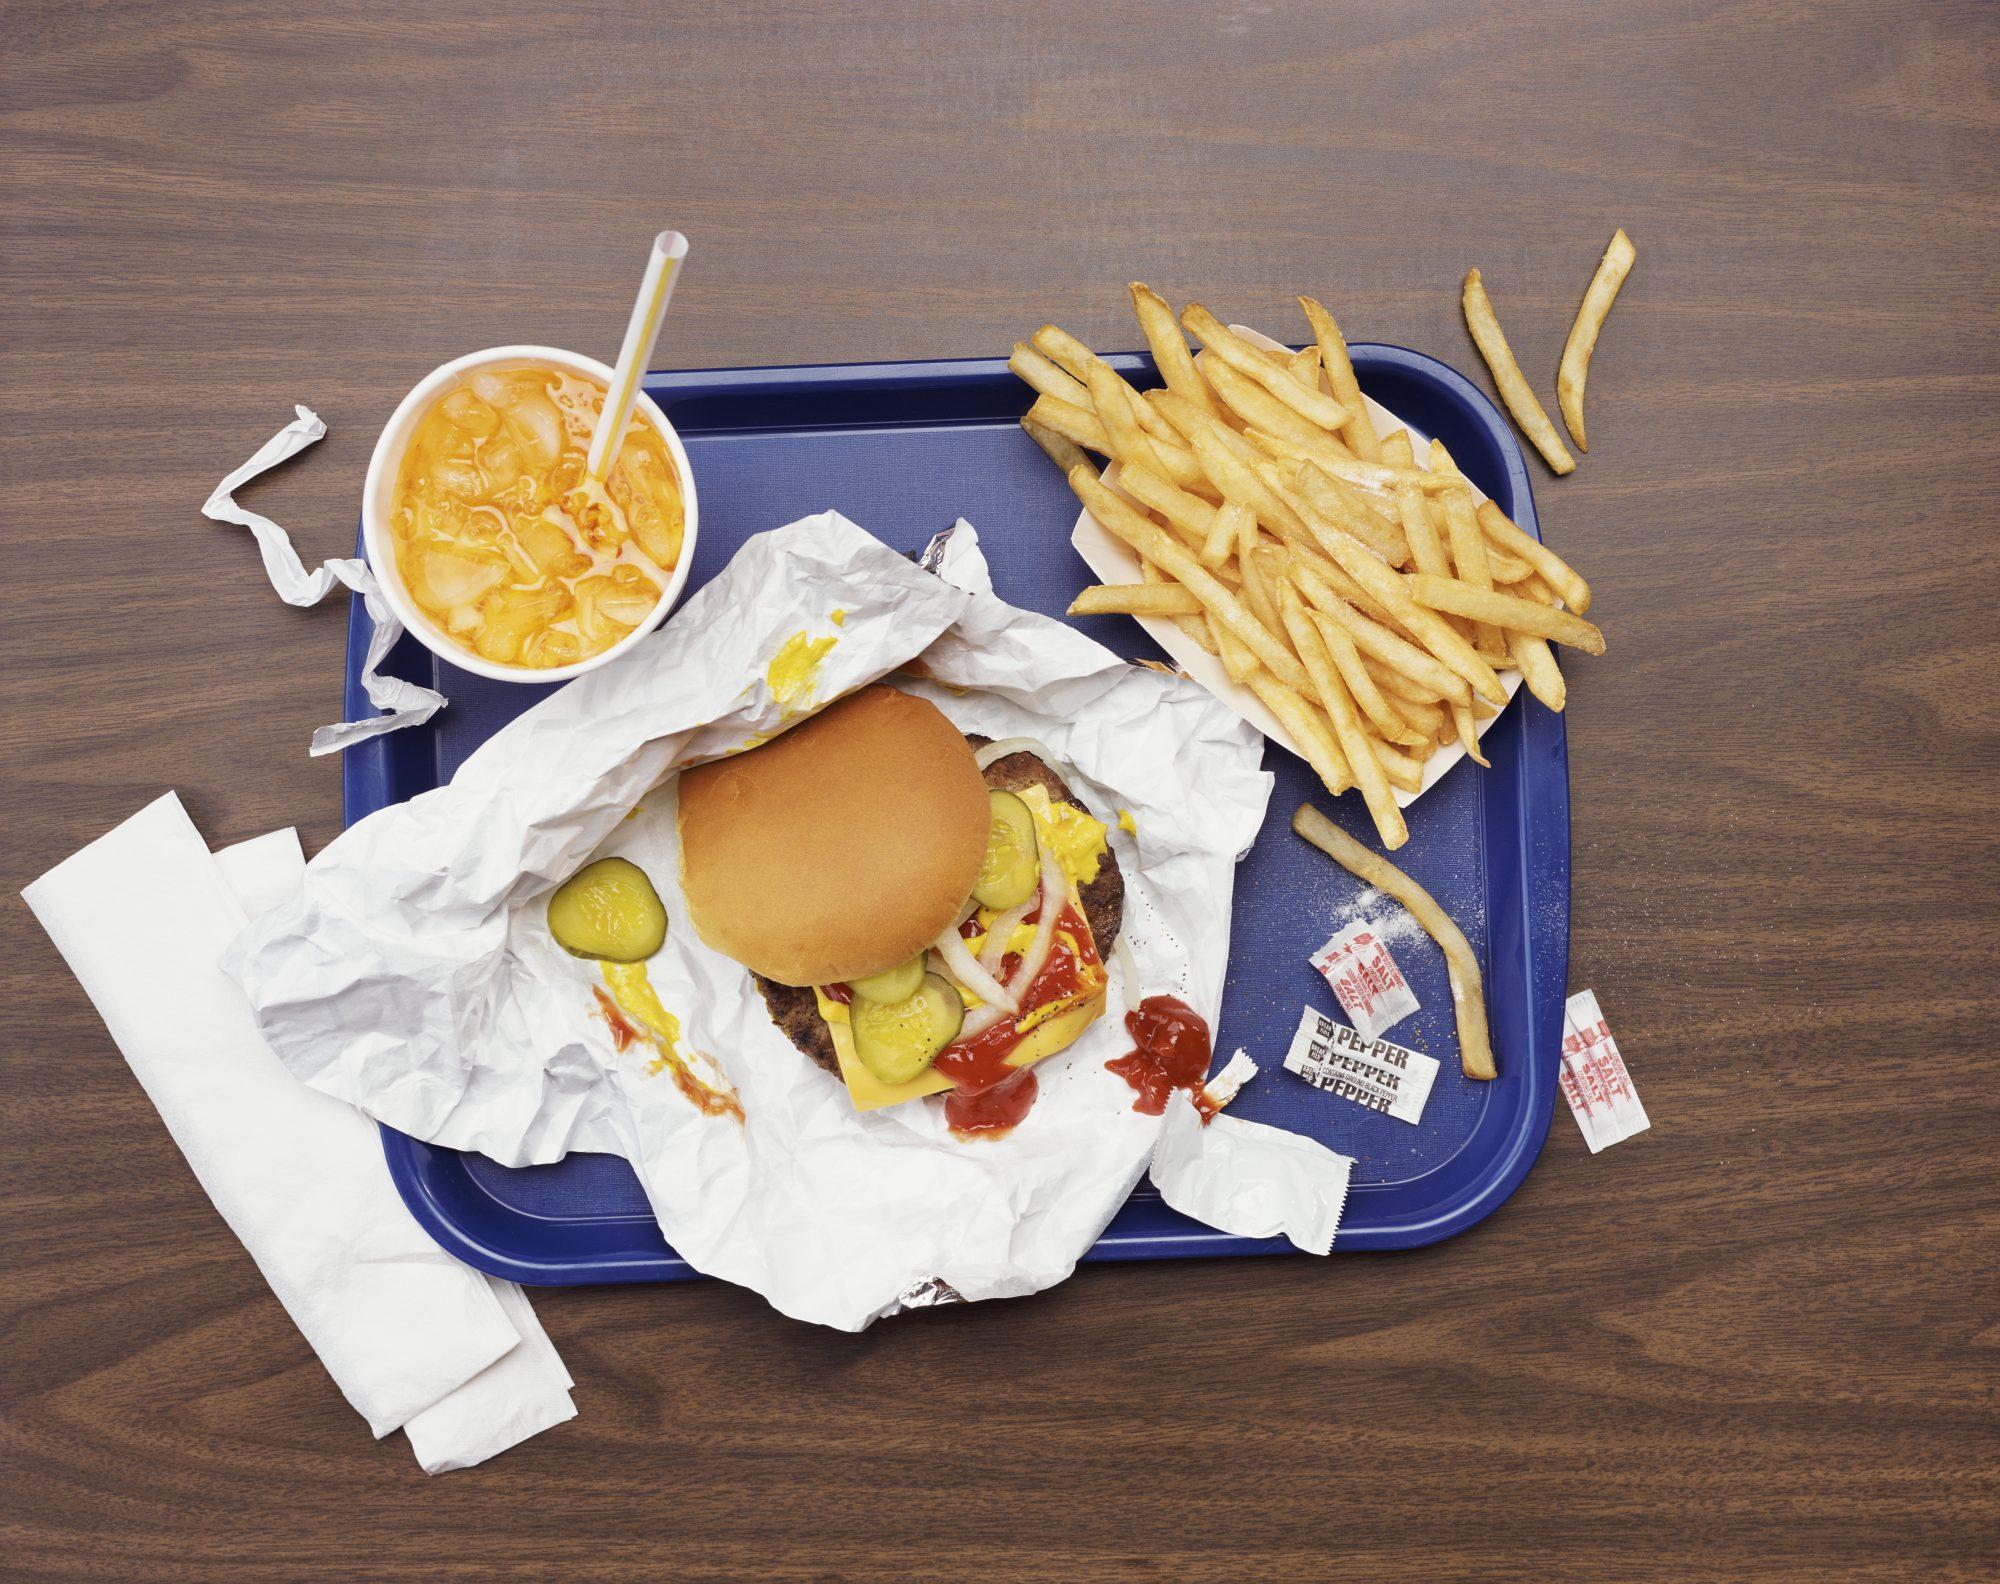 Burgers Getty 3/12/20